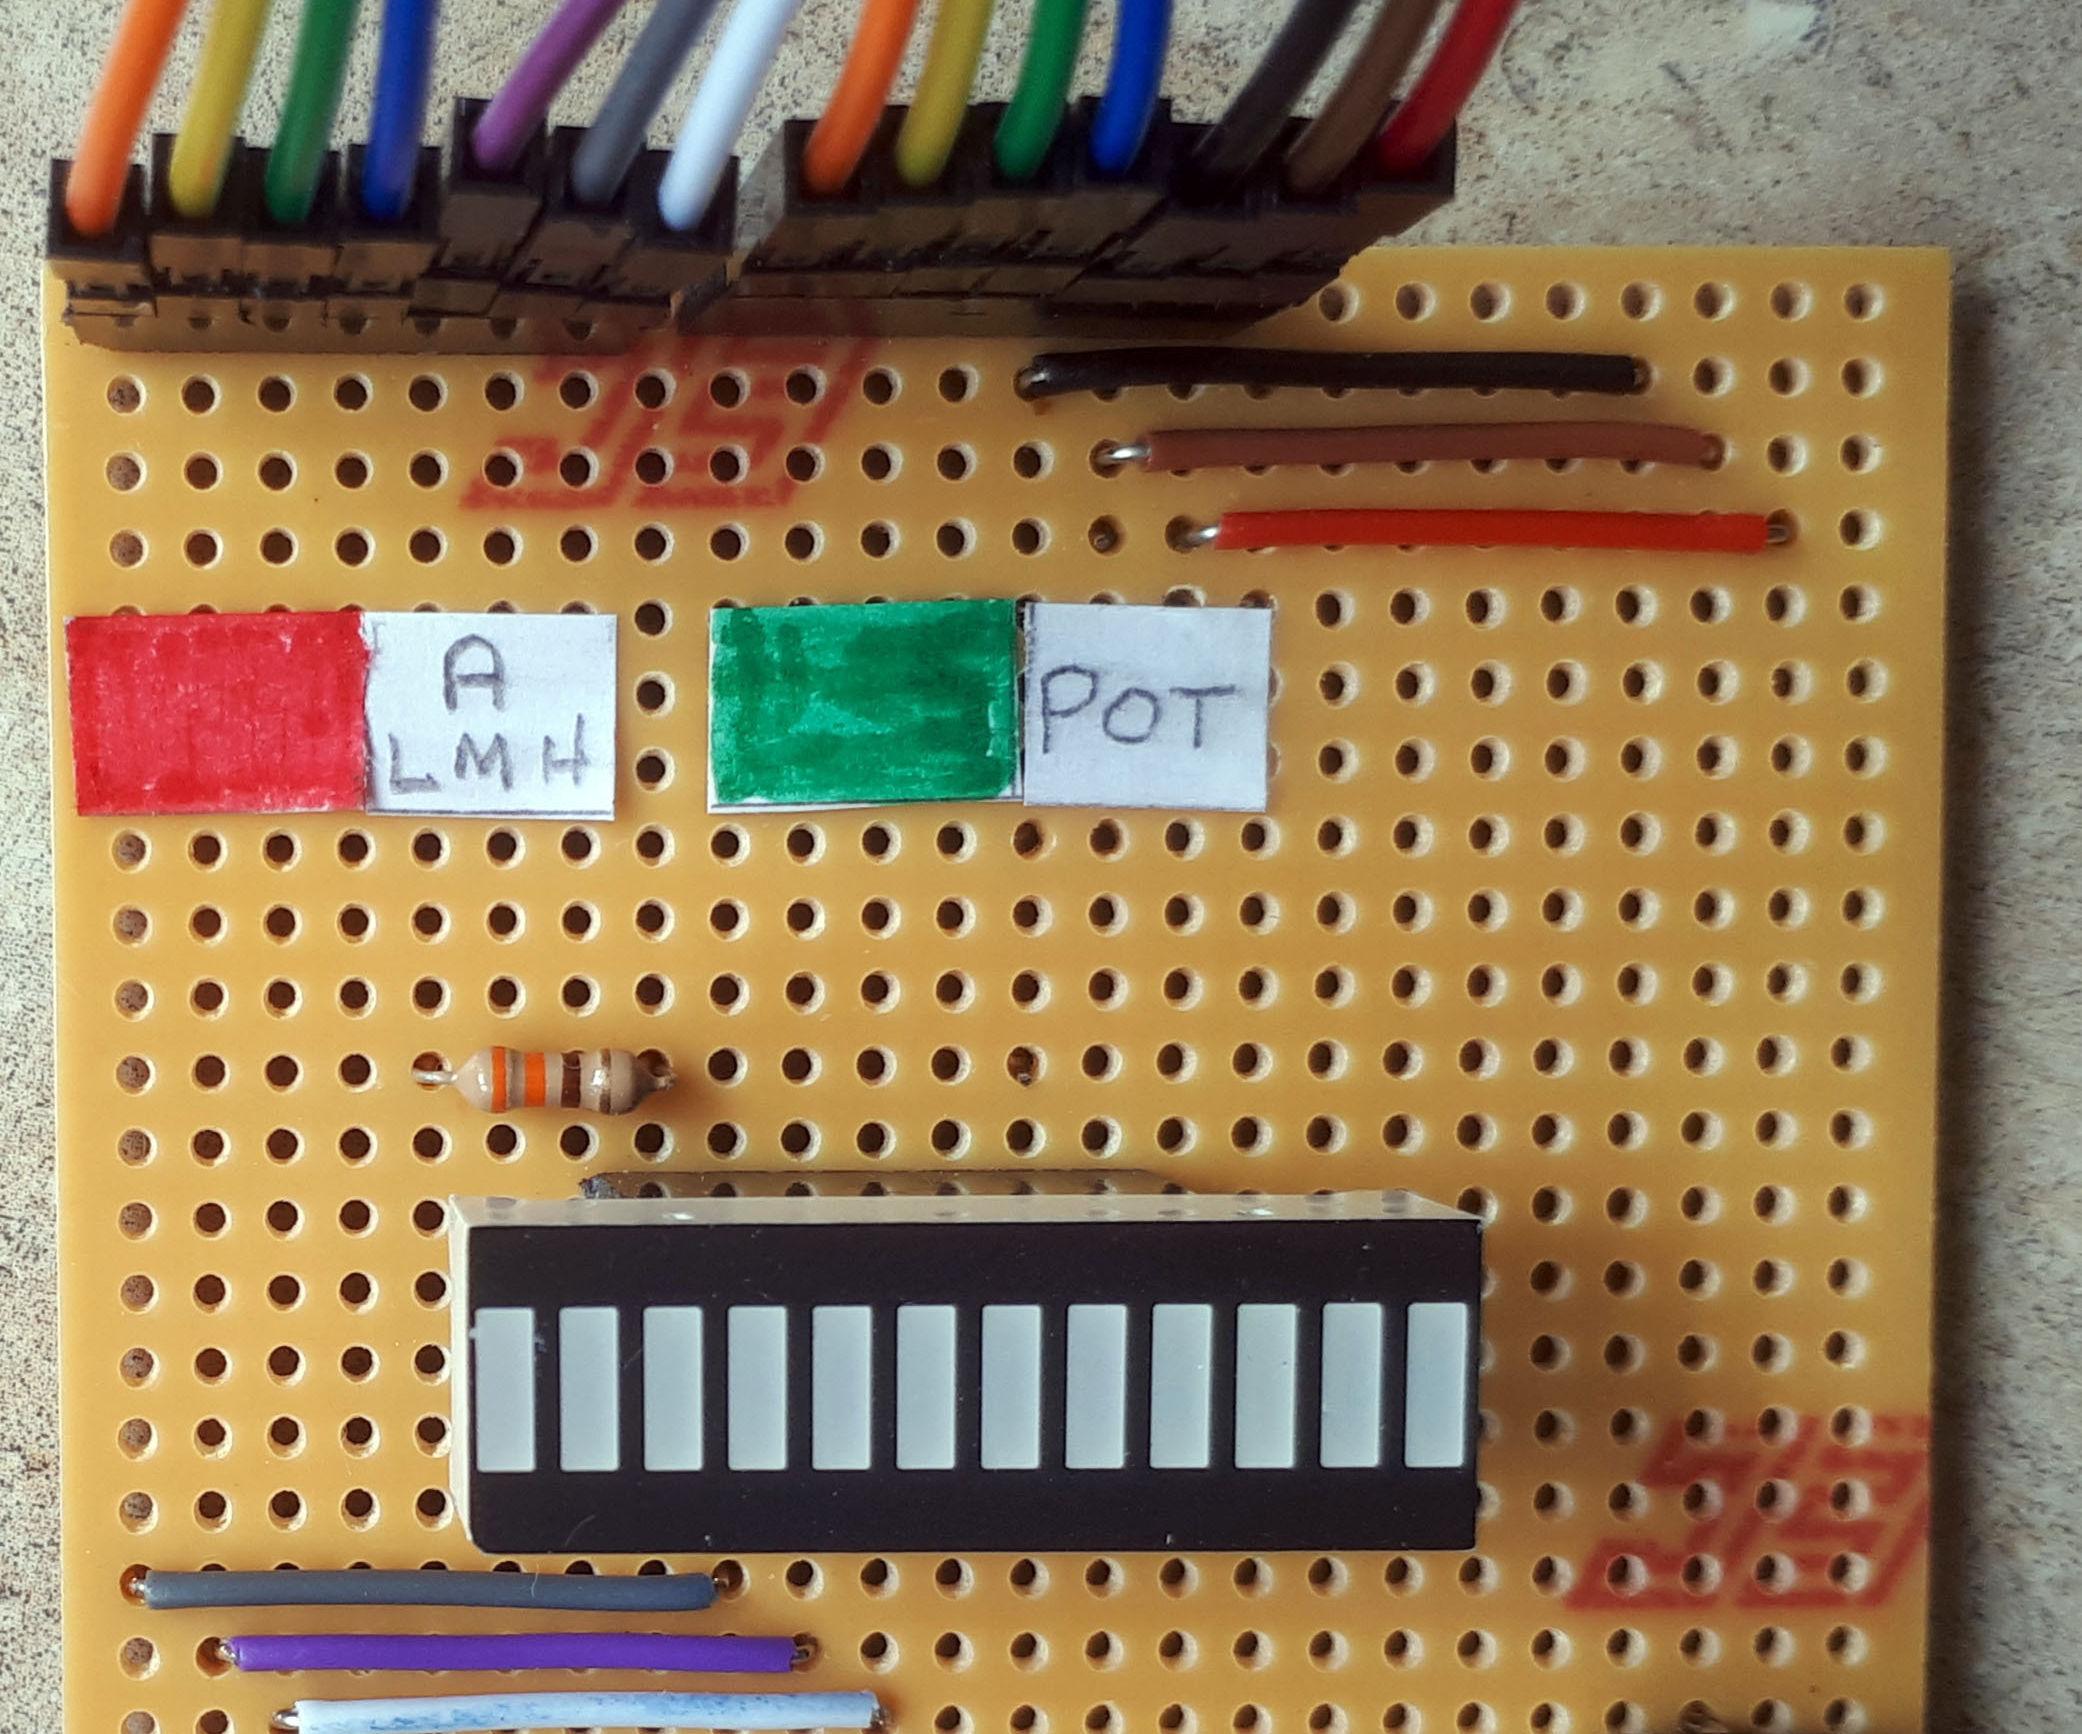 Dual Colour Bar Graph With CircuitPython